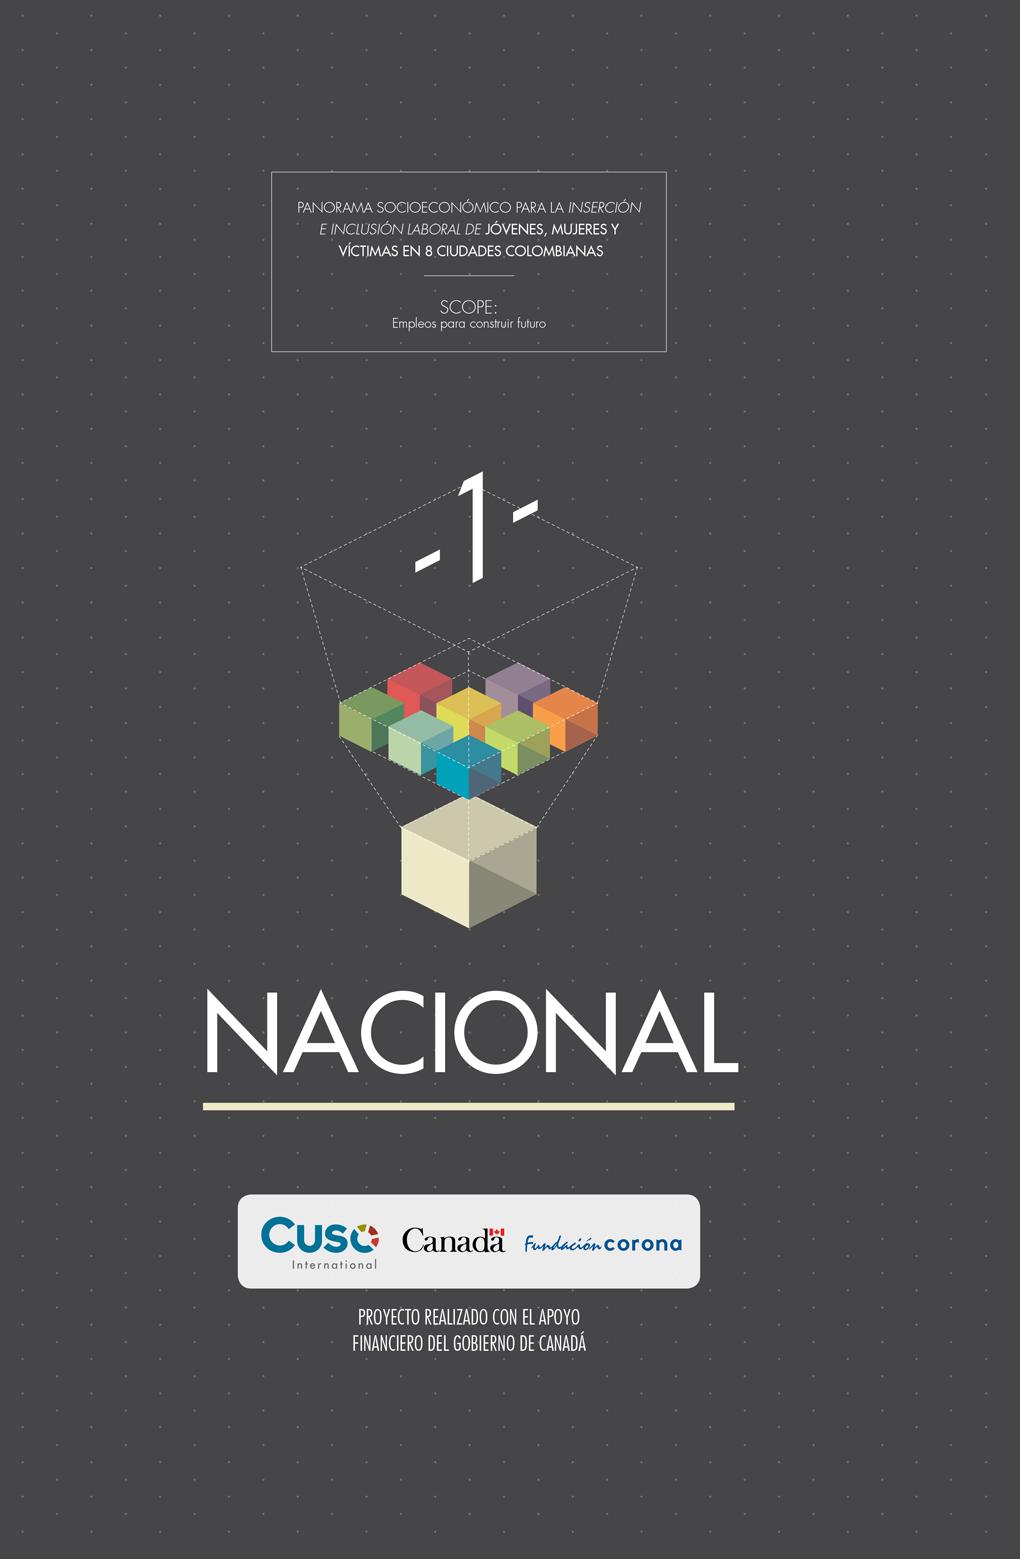 Panorama socioeconómico nacional